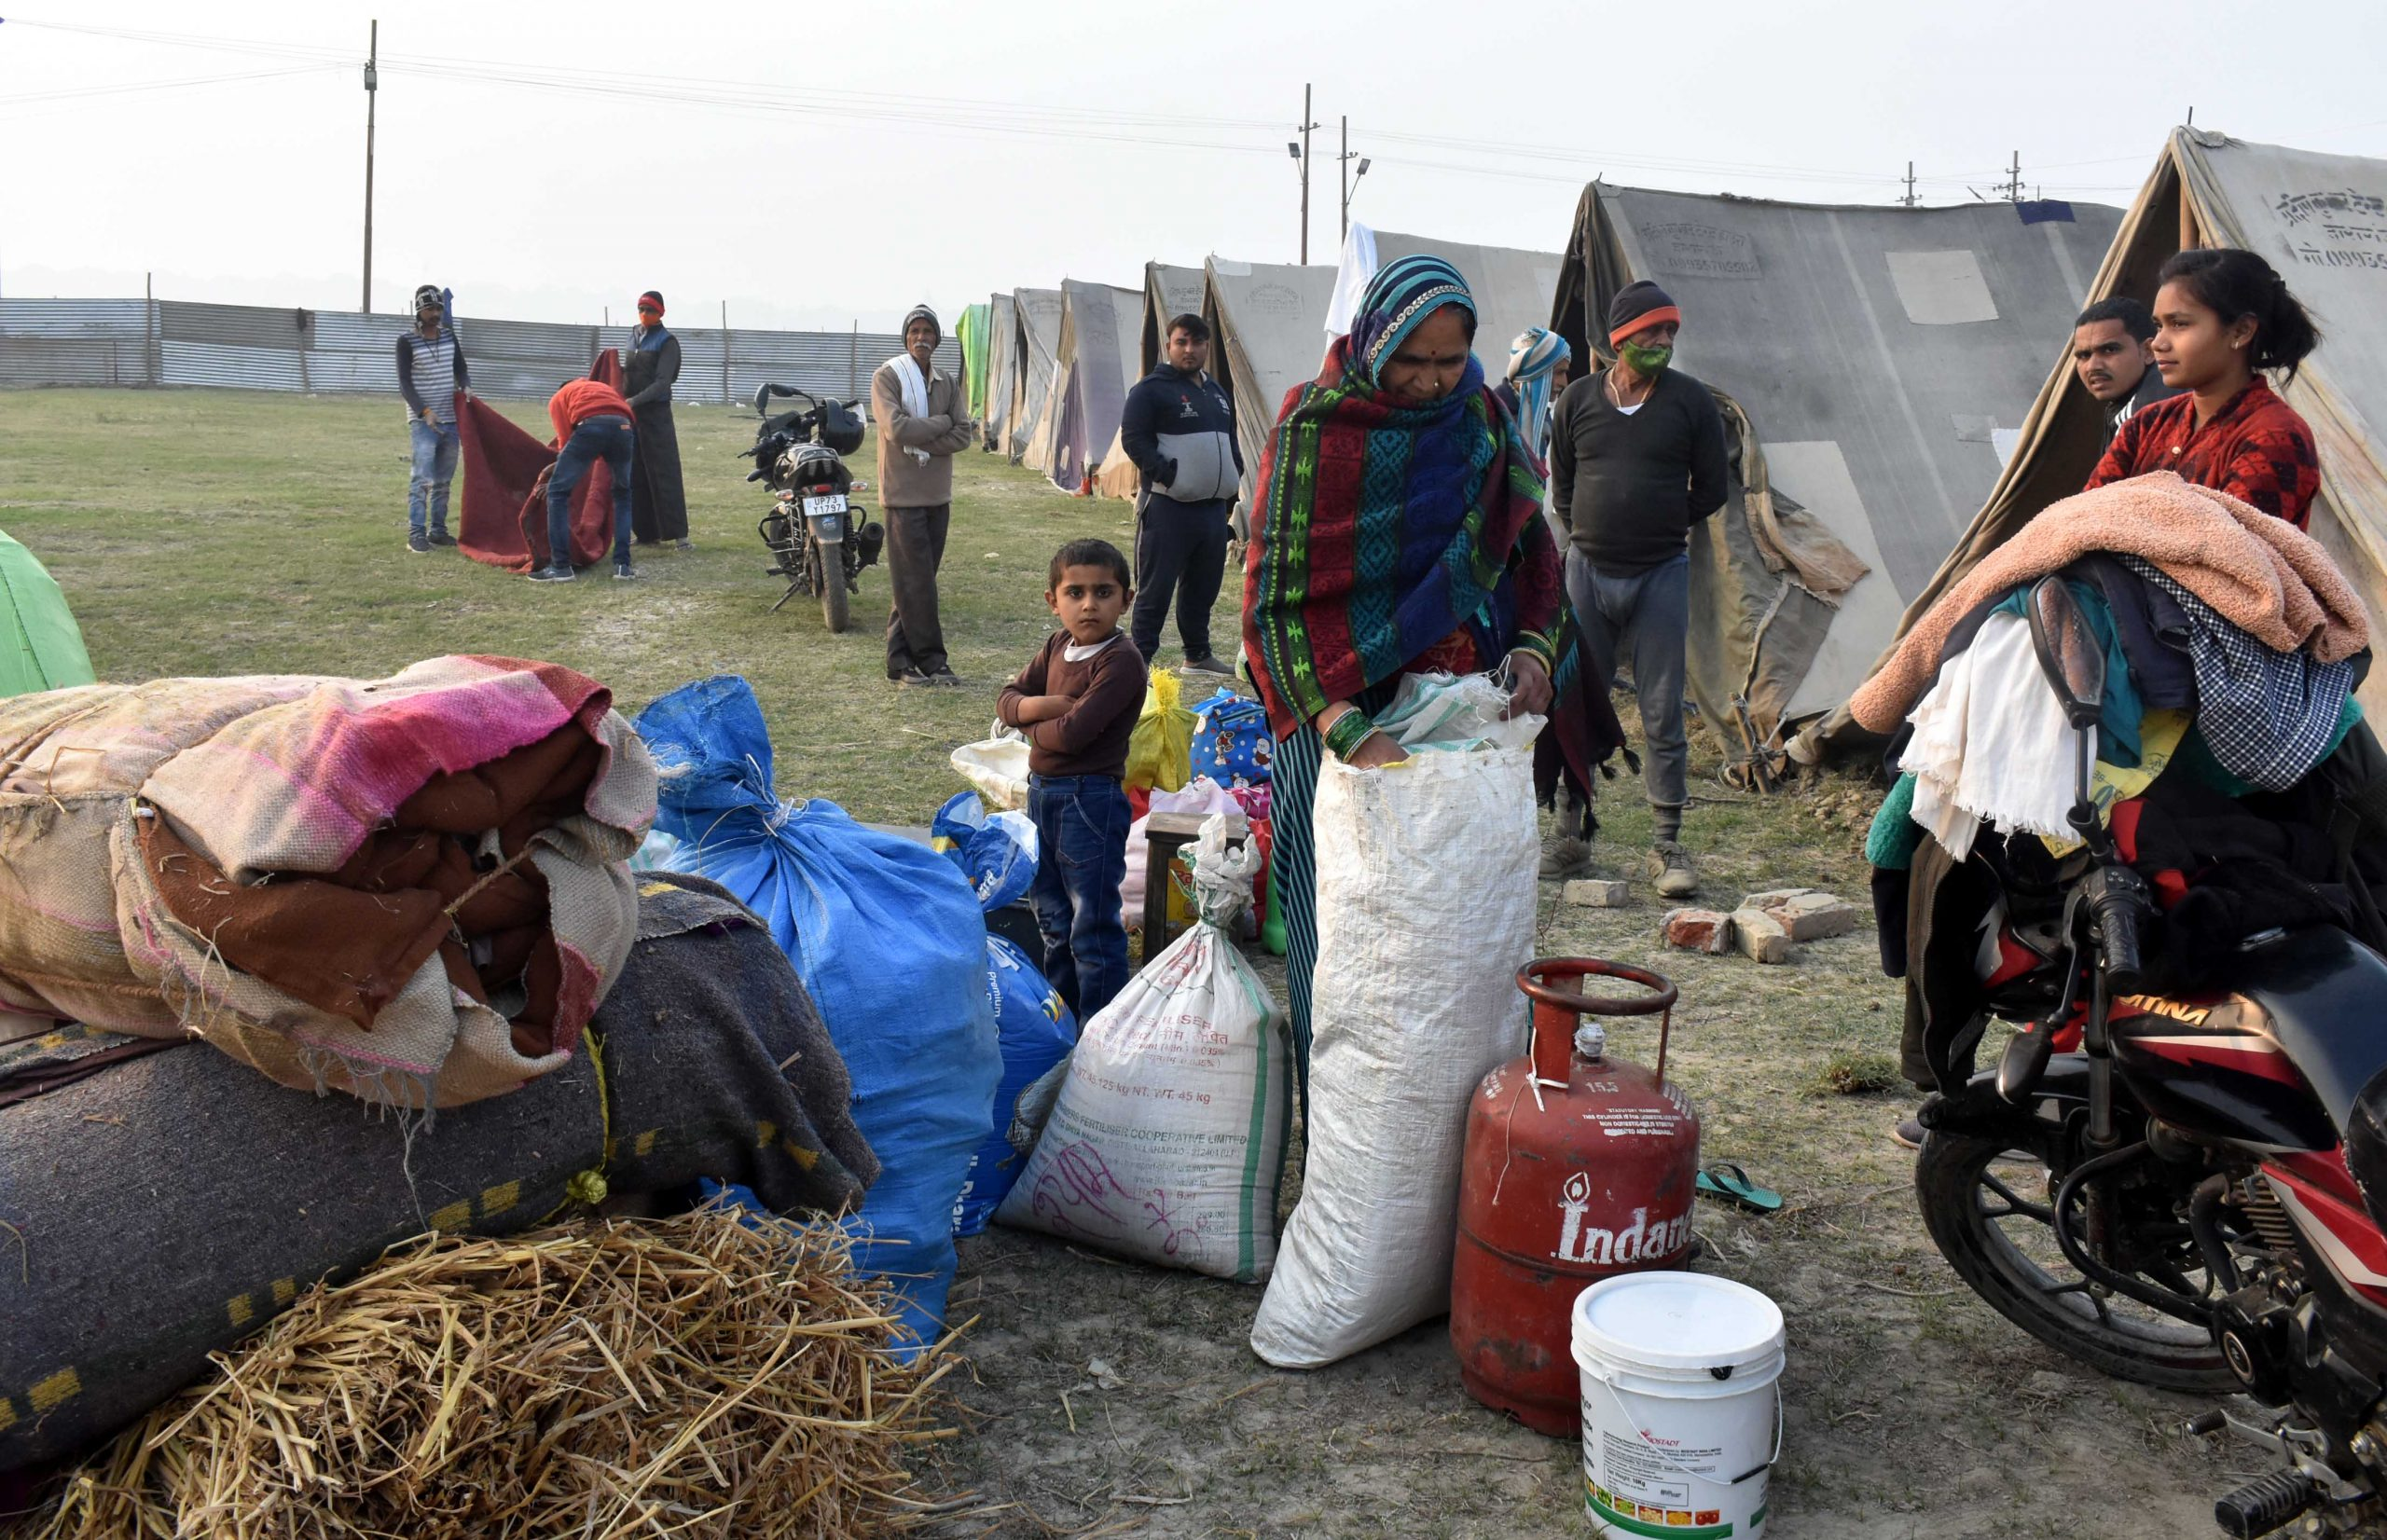 People near tents